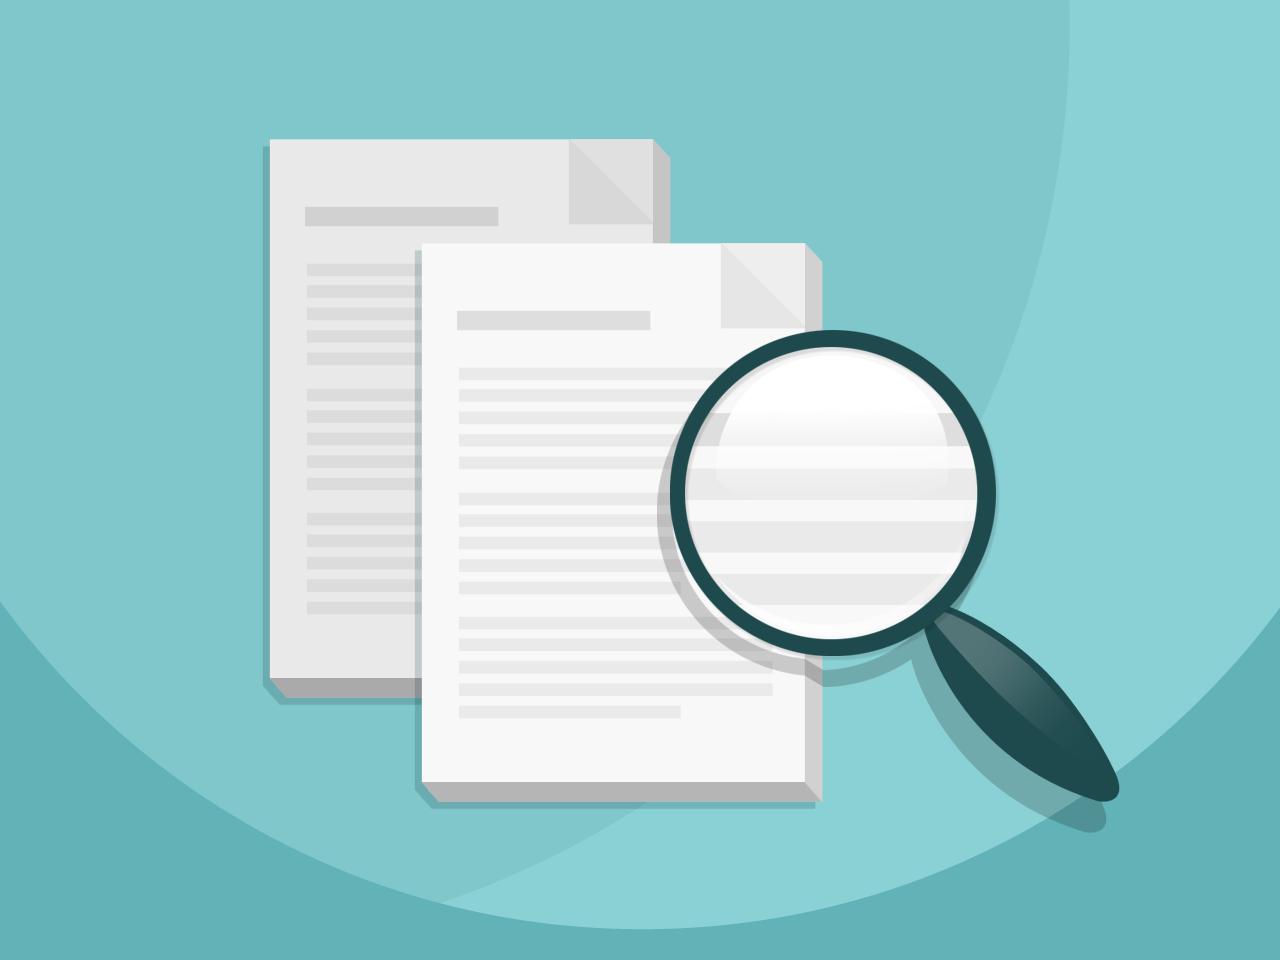 Workflowmanagement documentanalisys